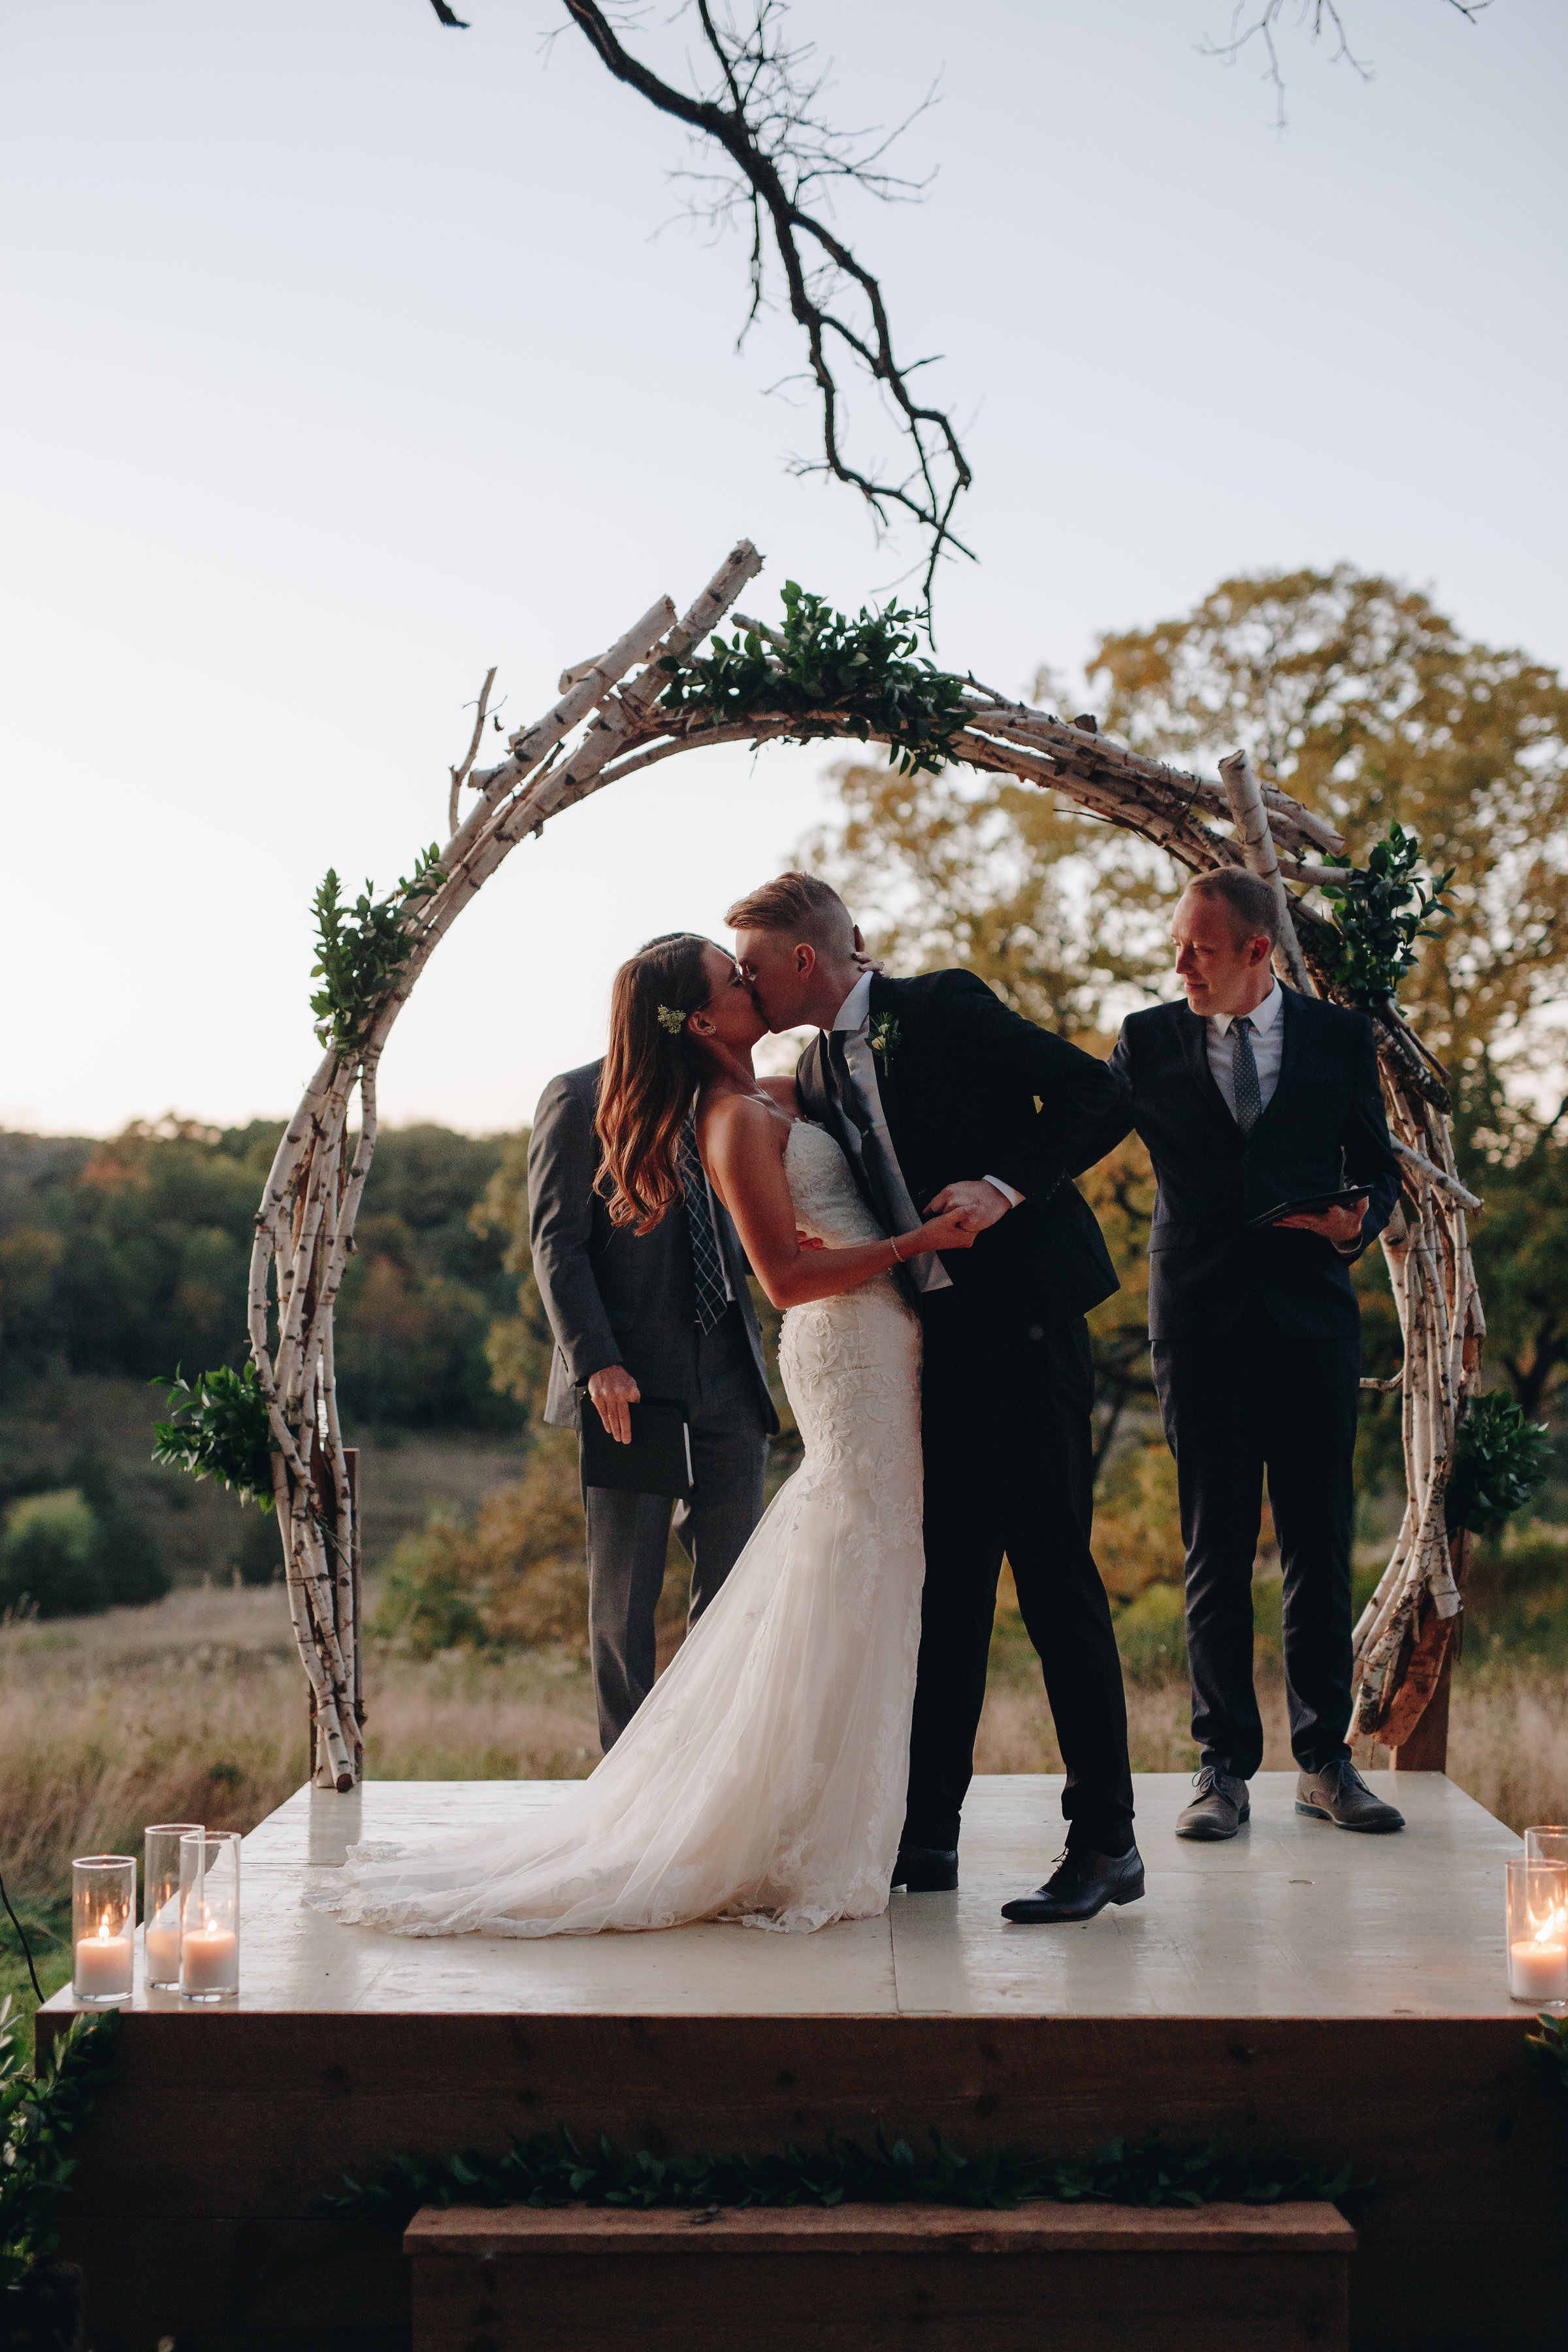 Bride and groom first kiss at wedding ceremony adventure wedding photographers Minnesota